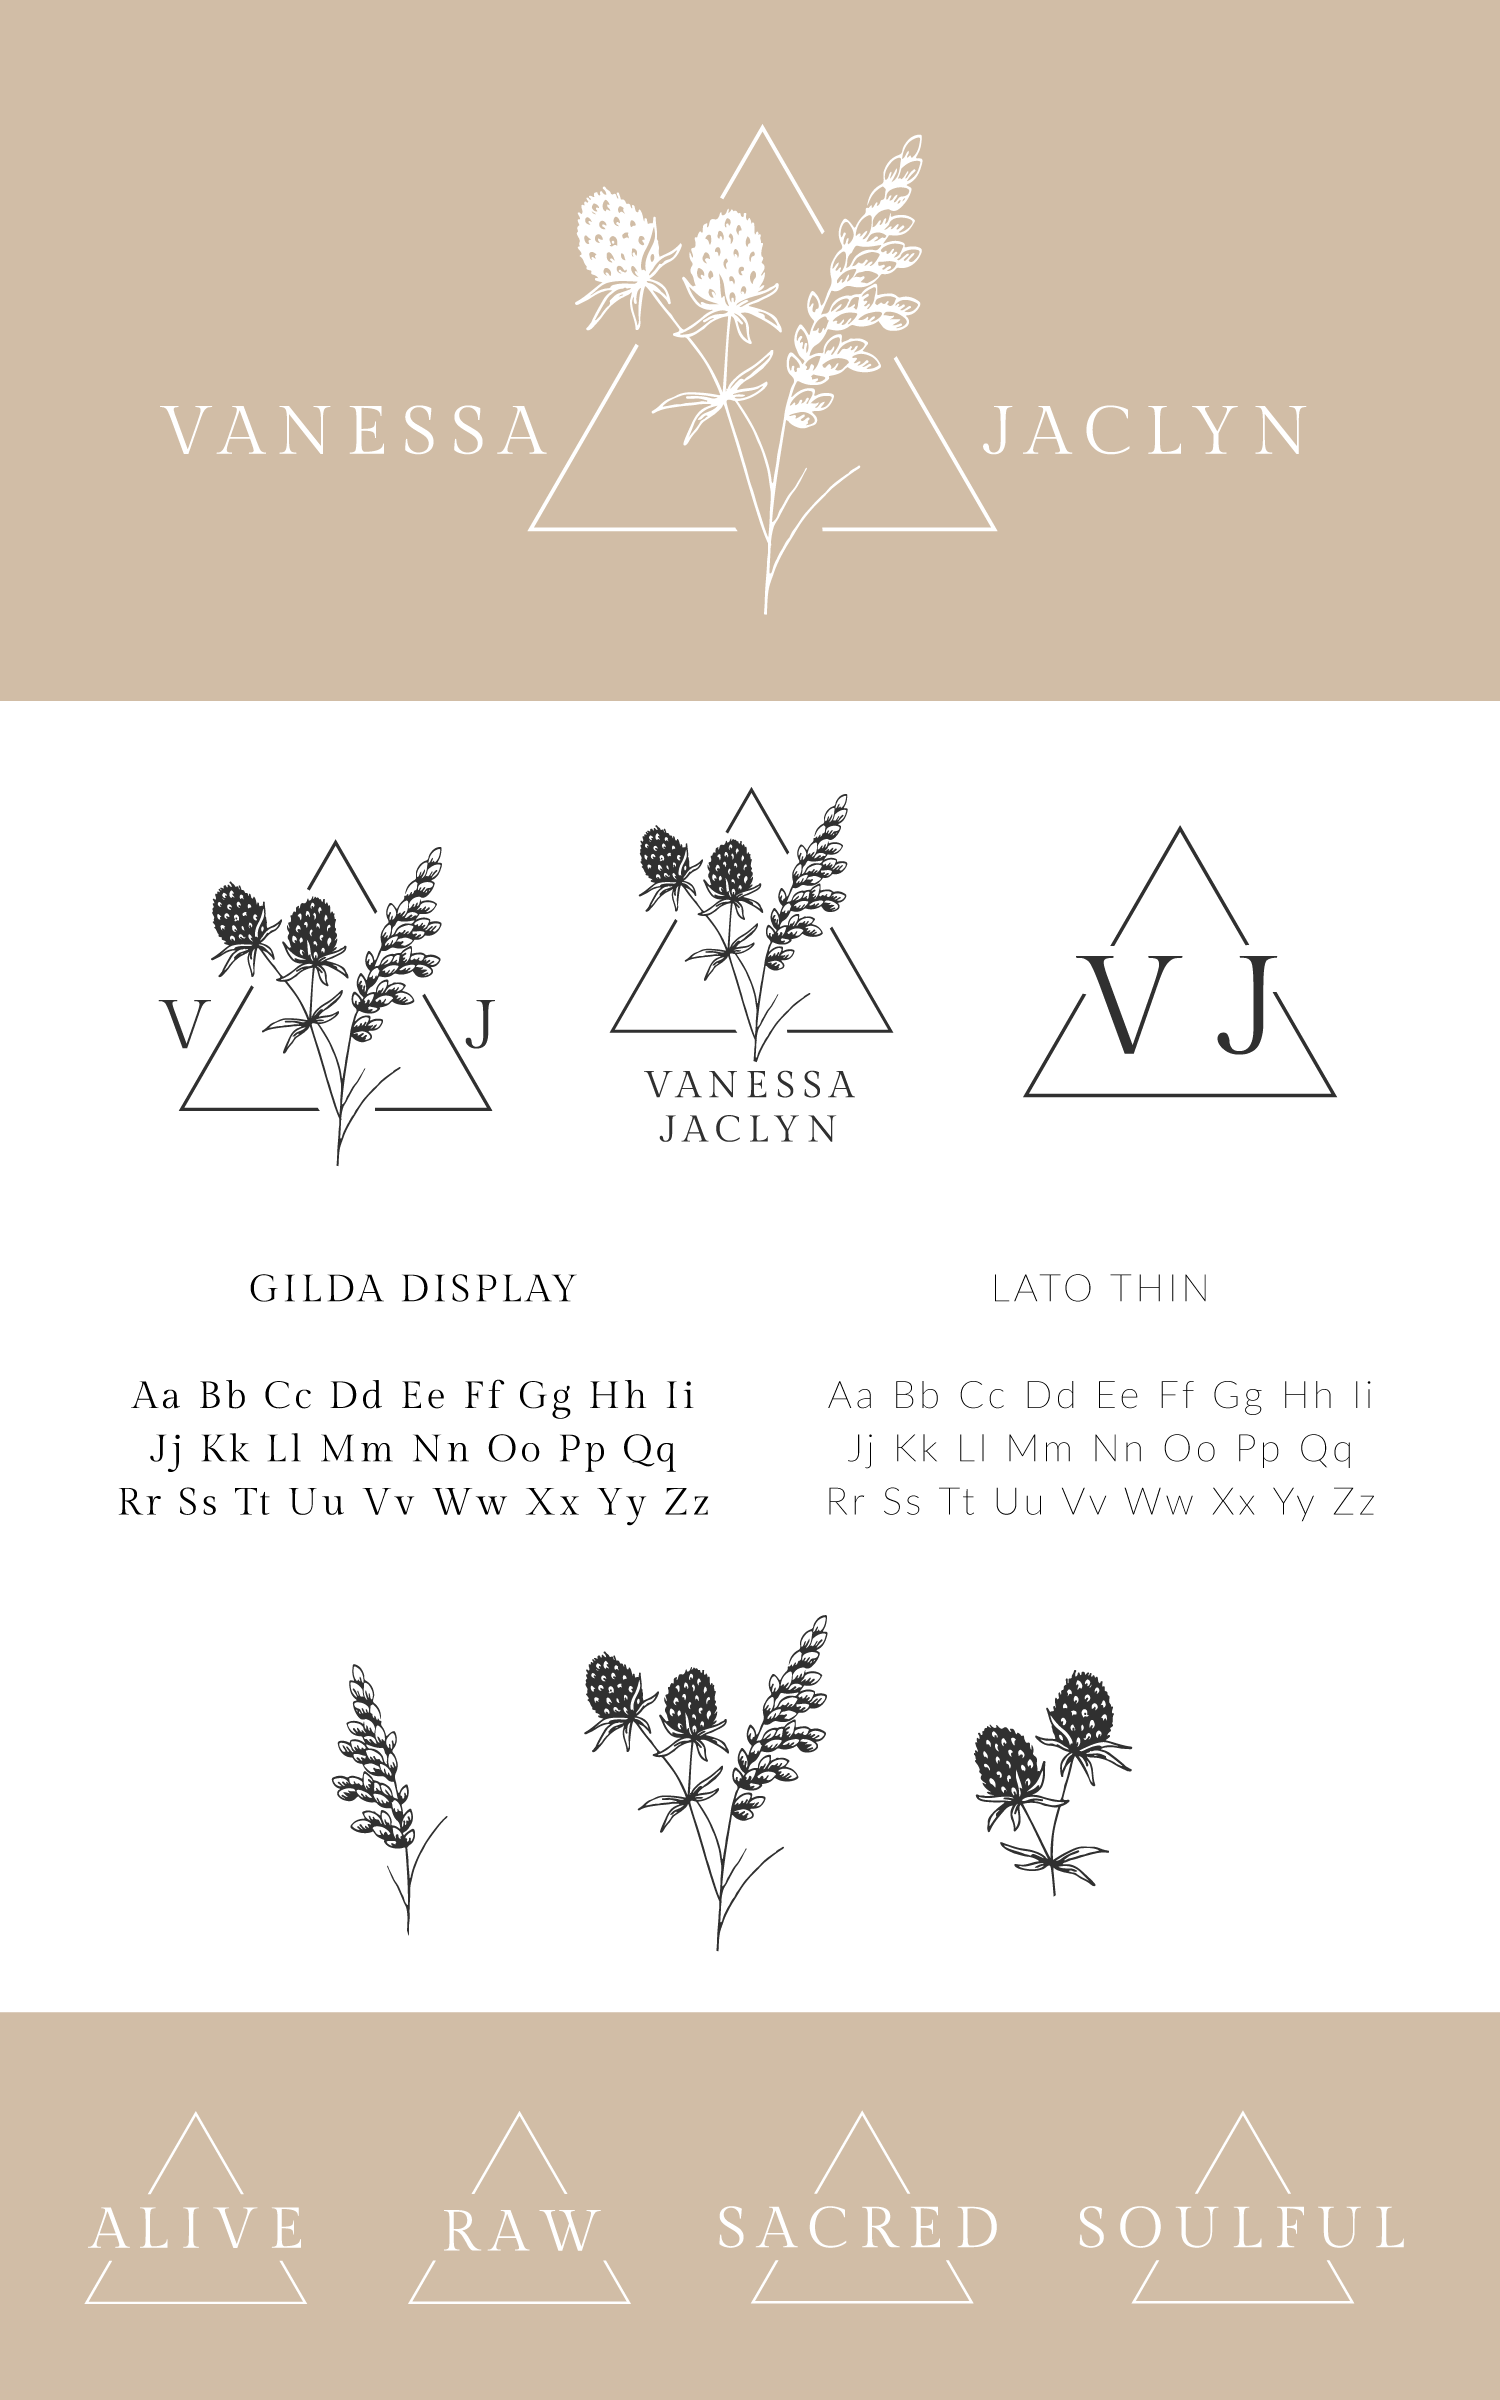 Vanessa Jaclyn Photography Logo & Branding by Bea & Bloom Creative Design Studio Mood board